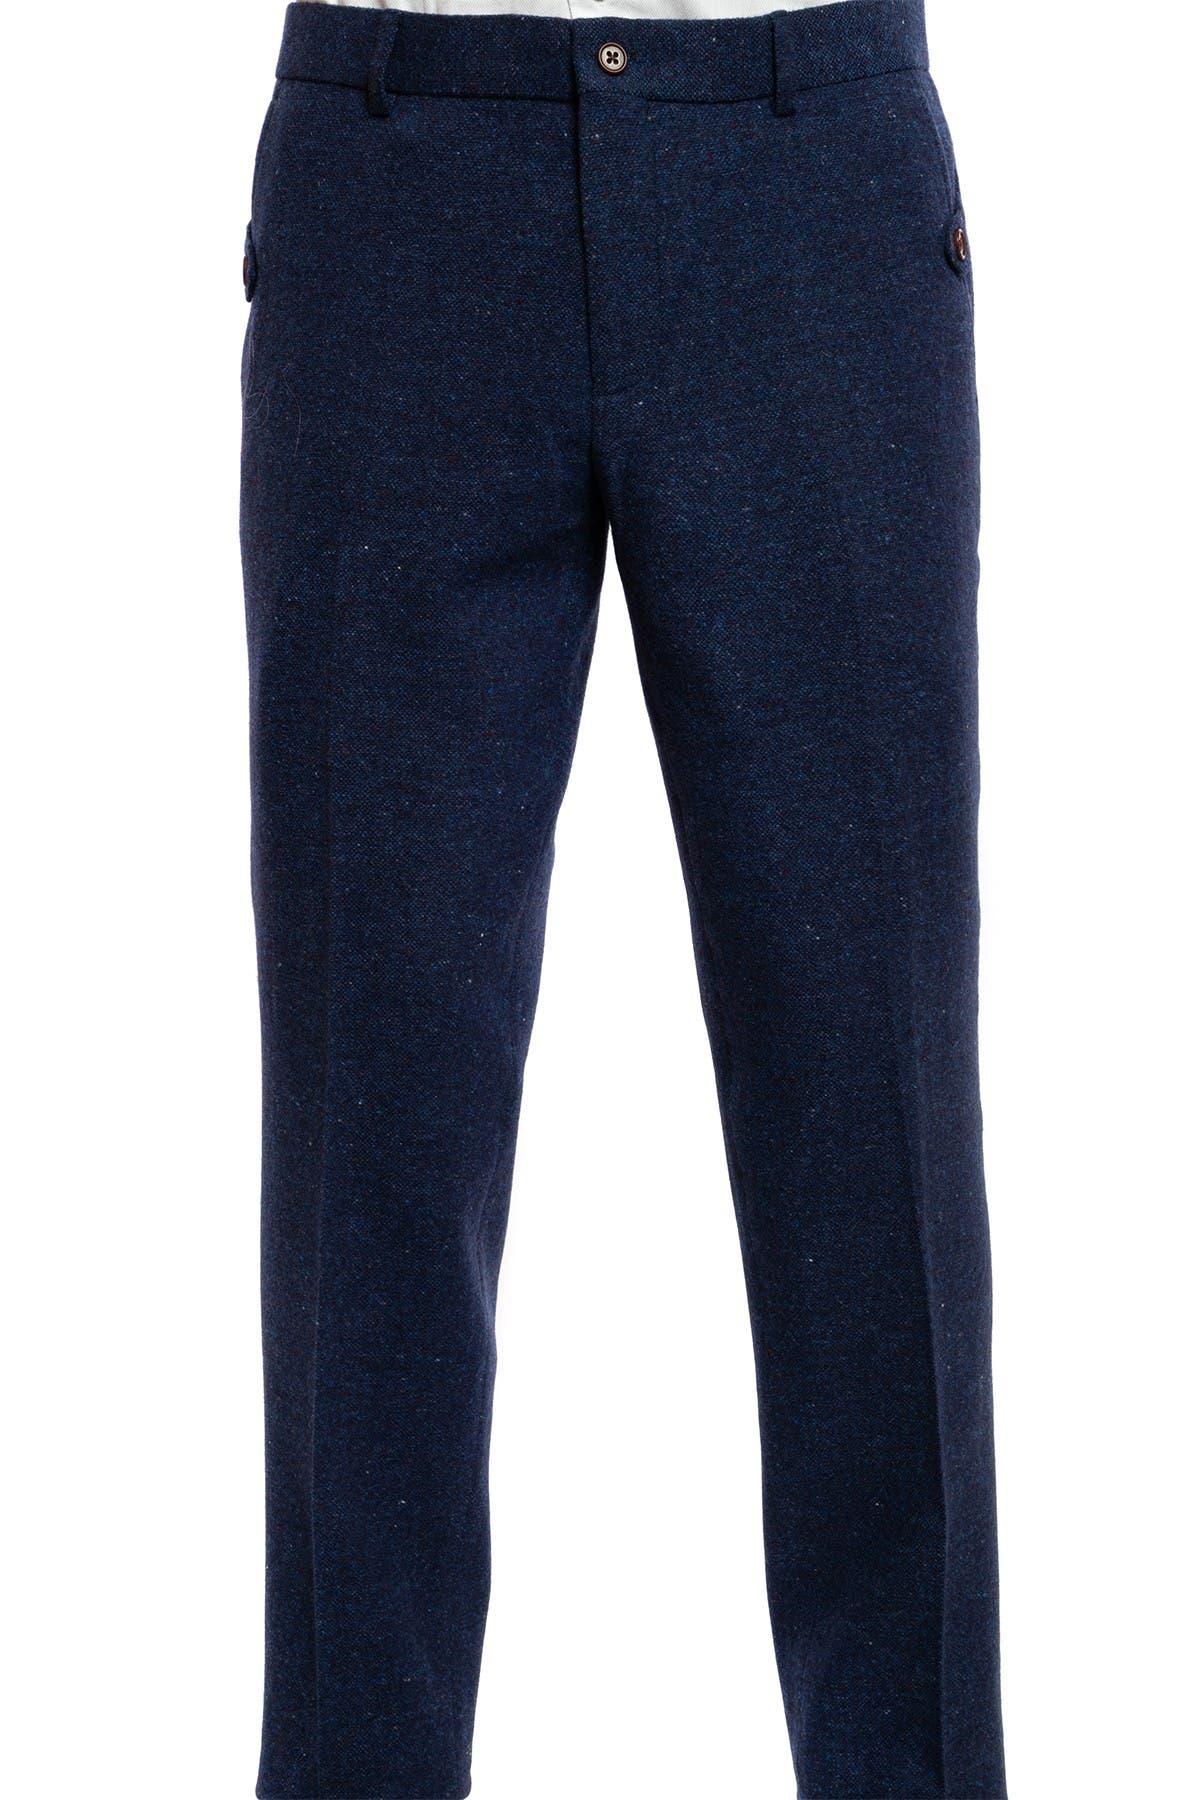 Image of Joe's Jeans Flat Front Straight Leg Pants